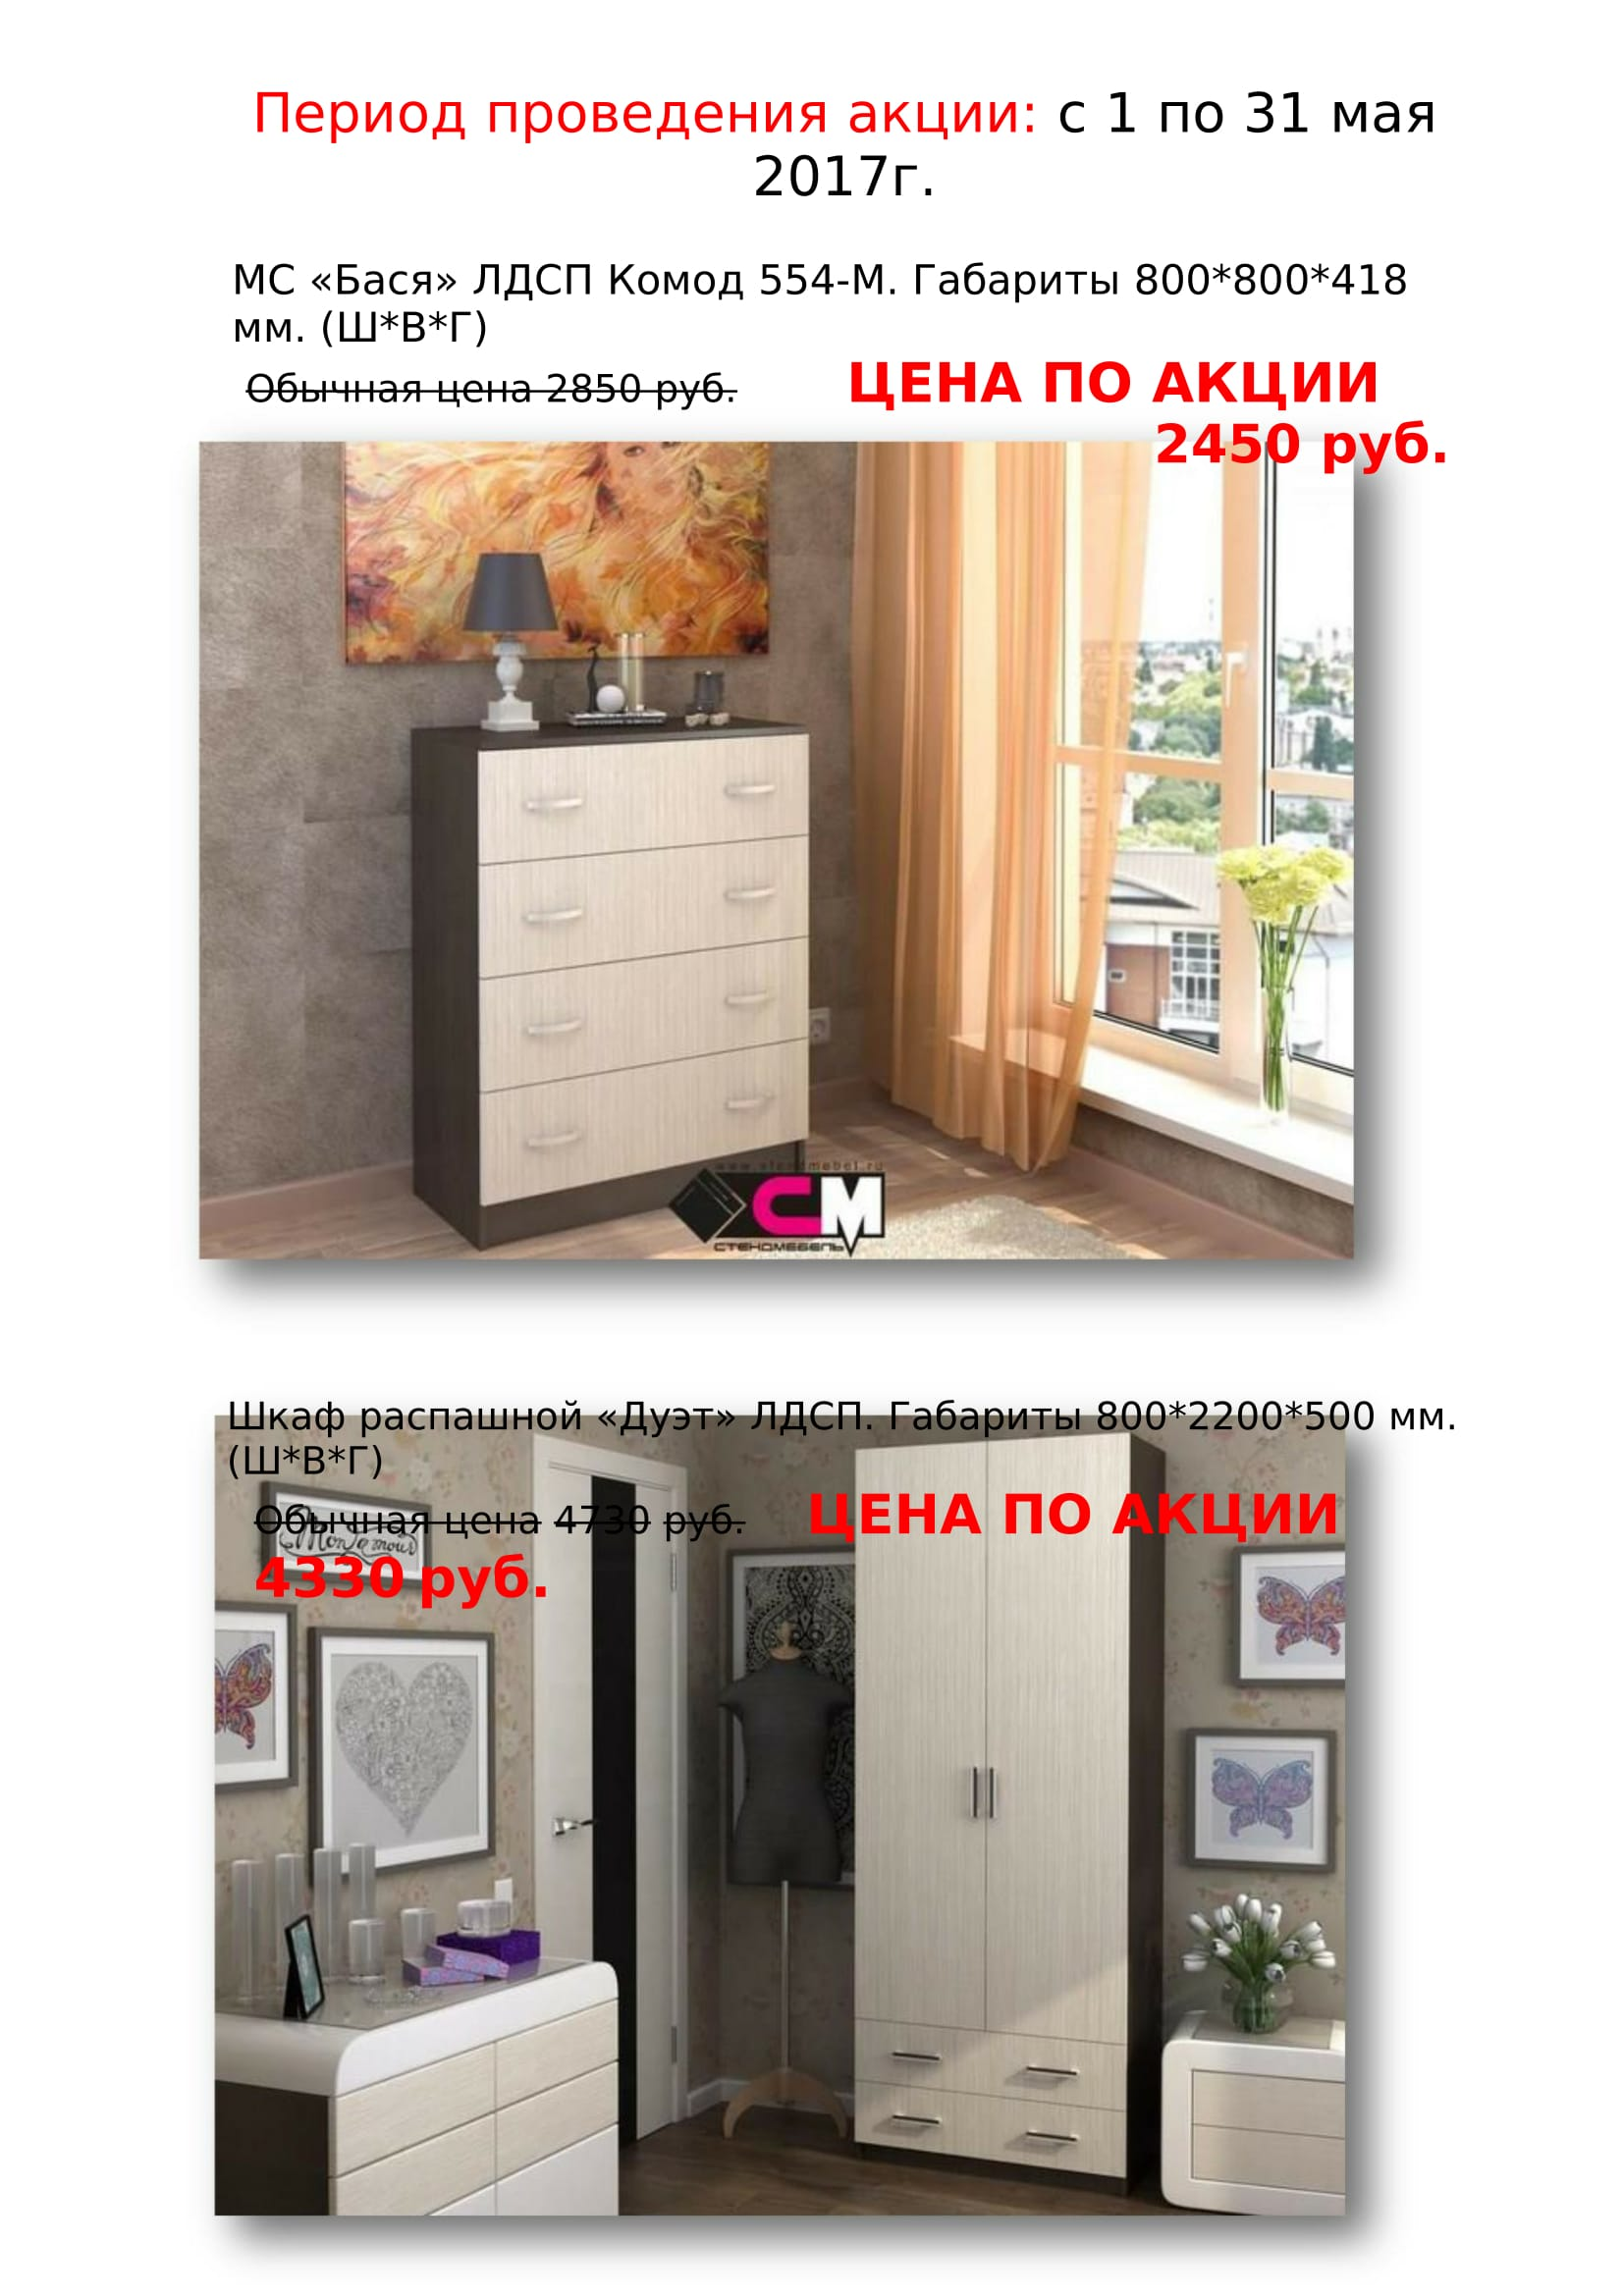 Акция СТЕНДМЕБЕЛЬ ШКАФЫ-1